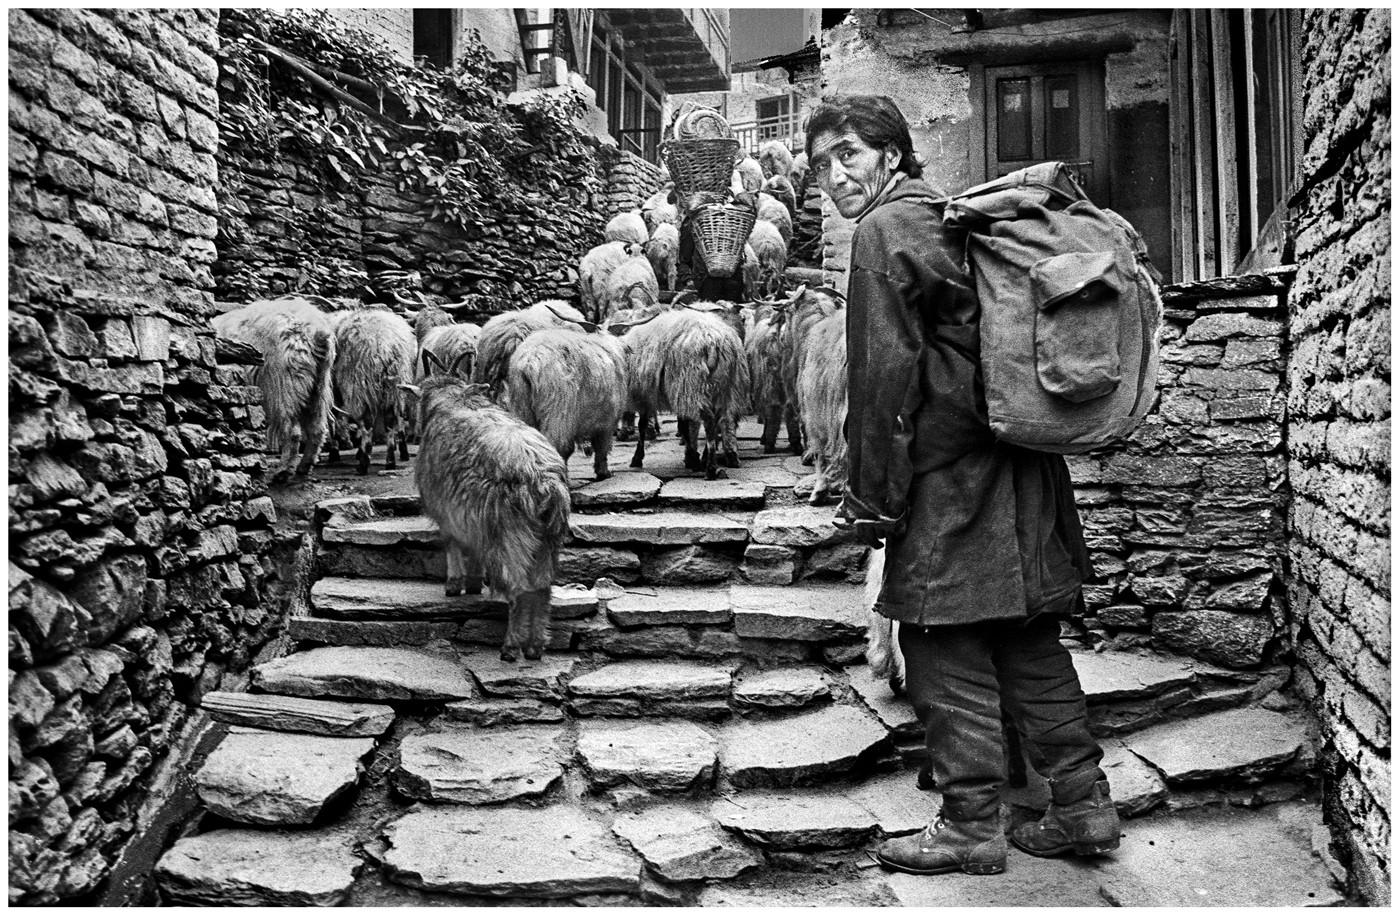 MONO - Nepali shepherd by Tom Dodd (14 marks)